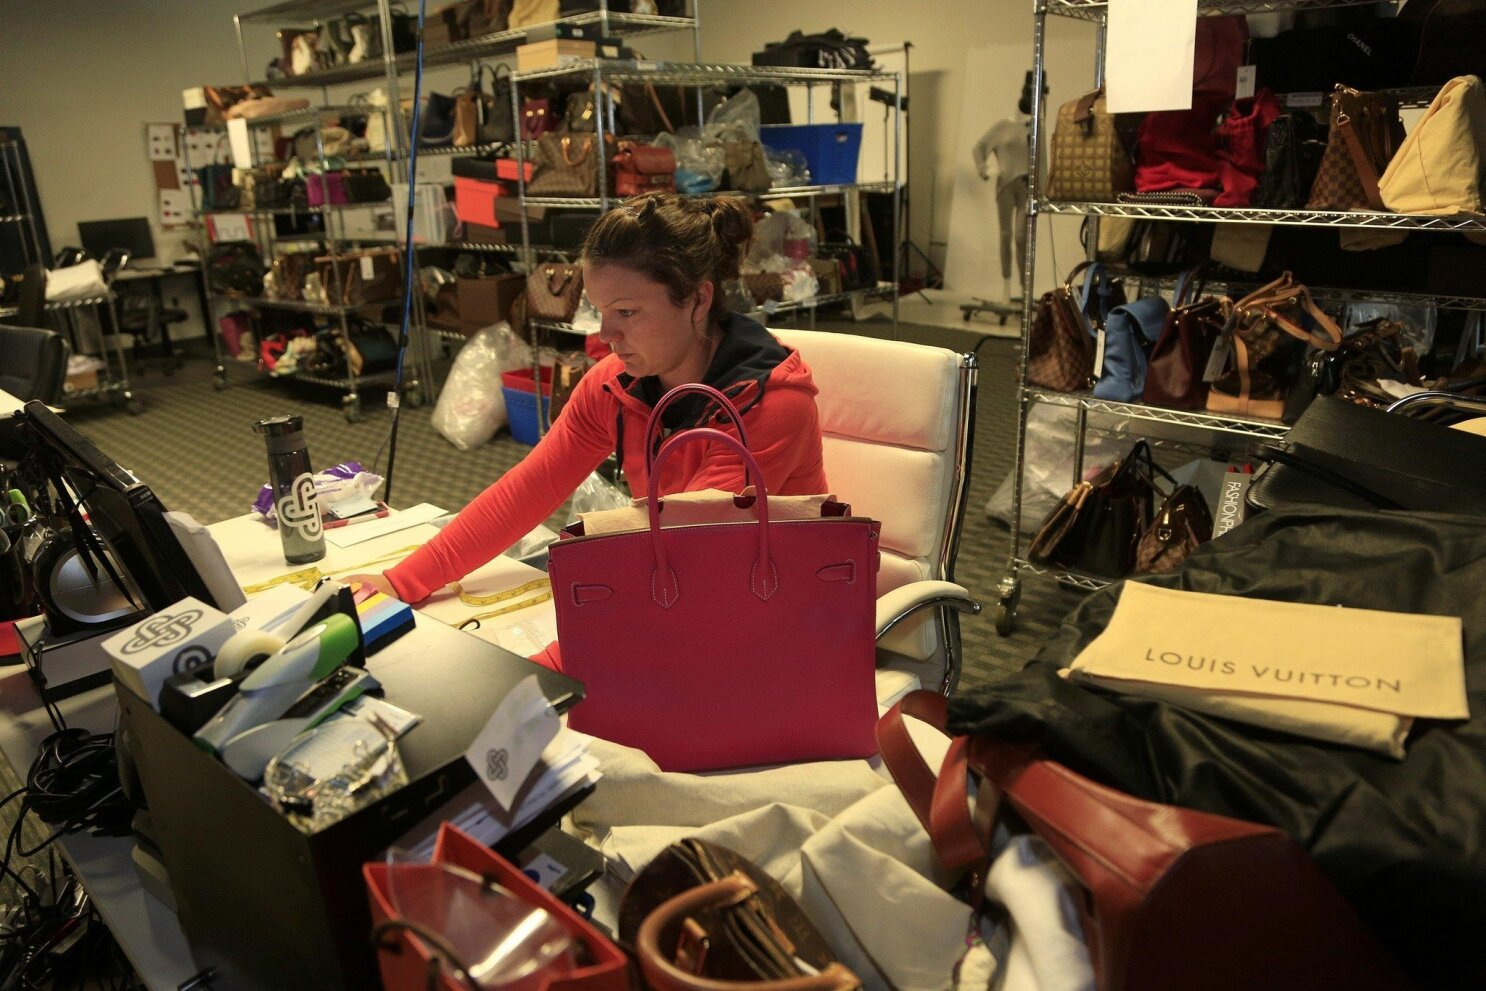 67dbf6dd0b Re-selling swank is big business - The San Diego Union-Tribune